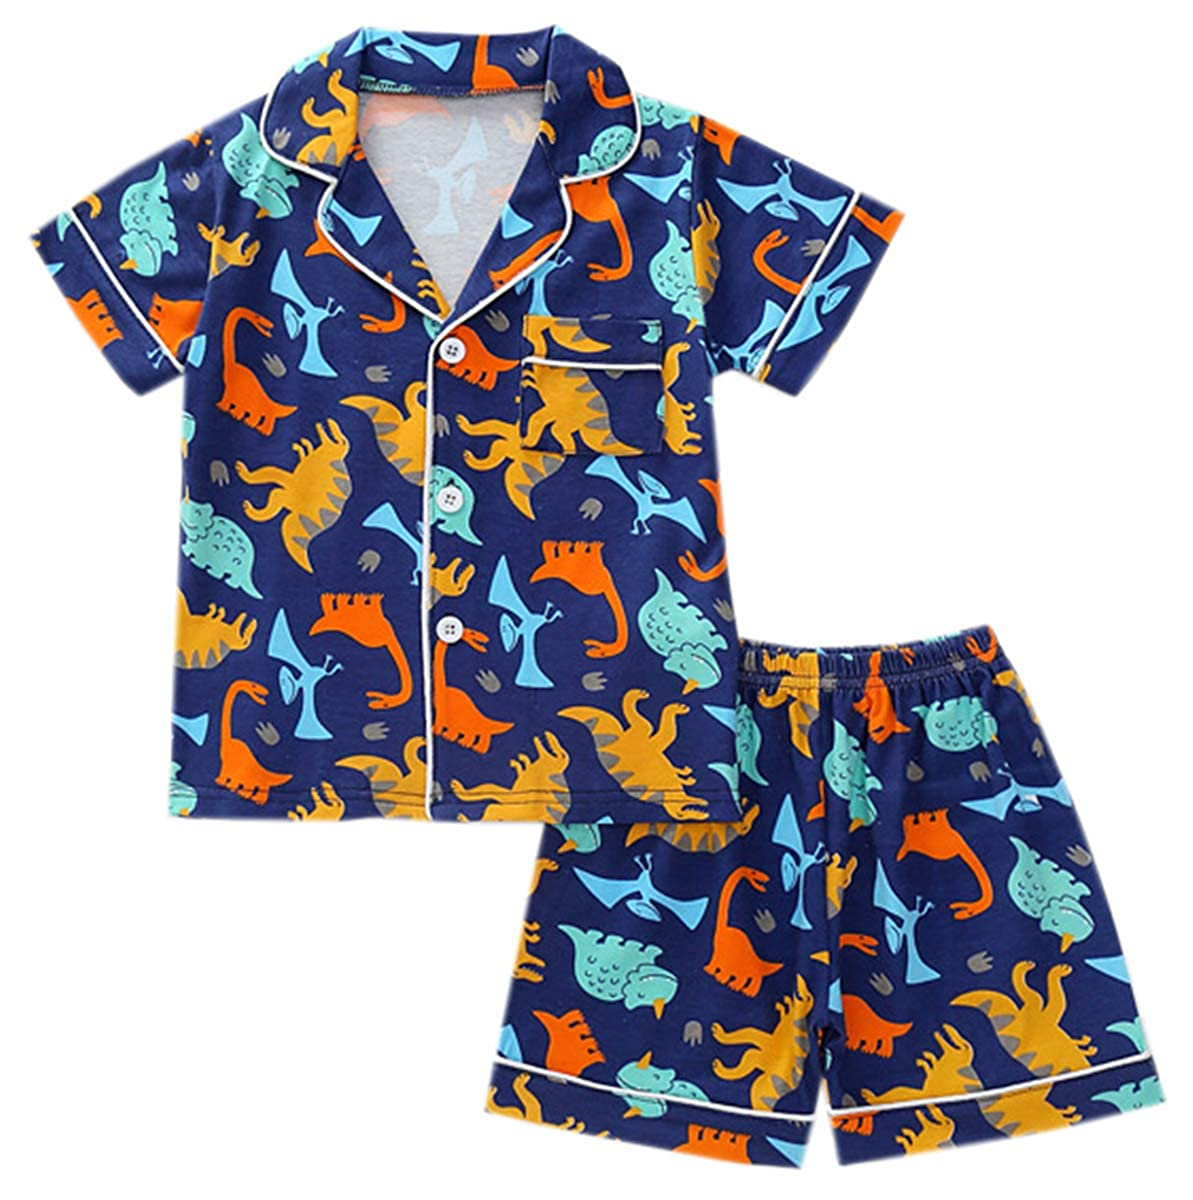 12 Months Ameyda Kids Boys Girls Short Pajamas Set 10 Years